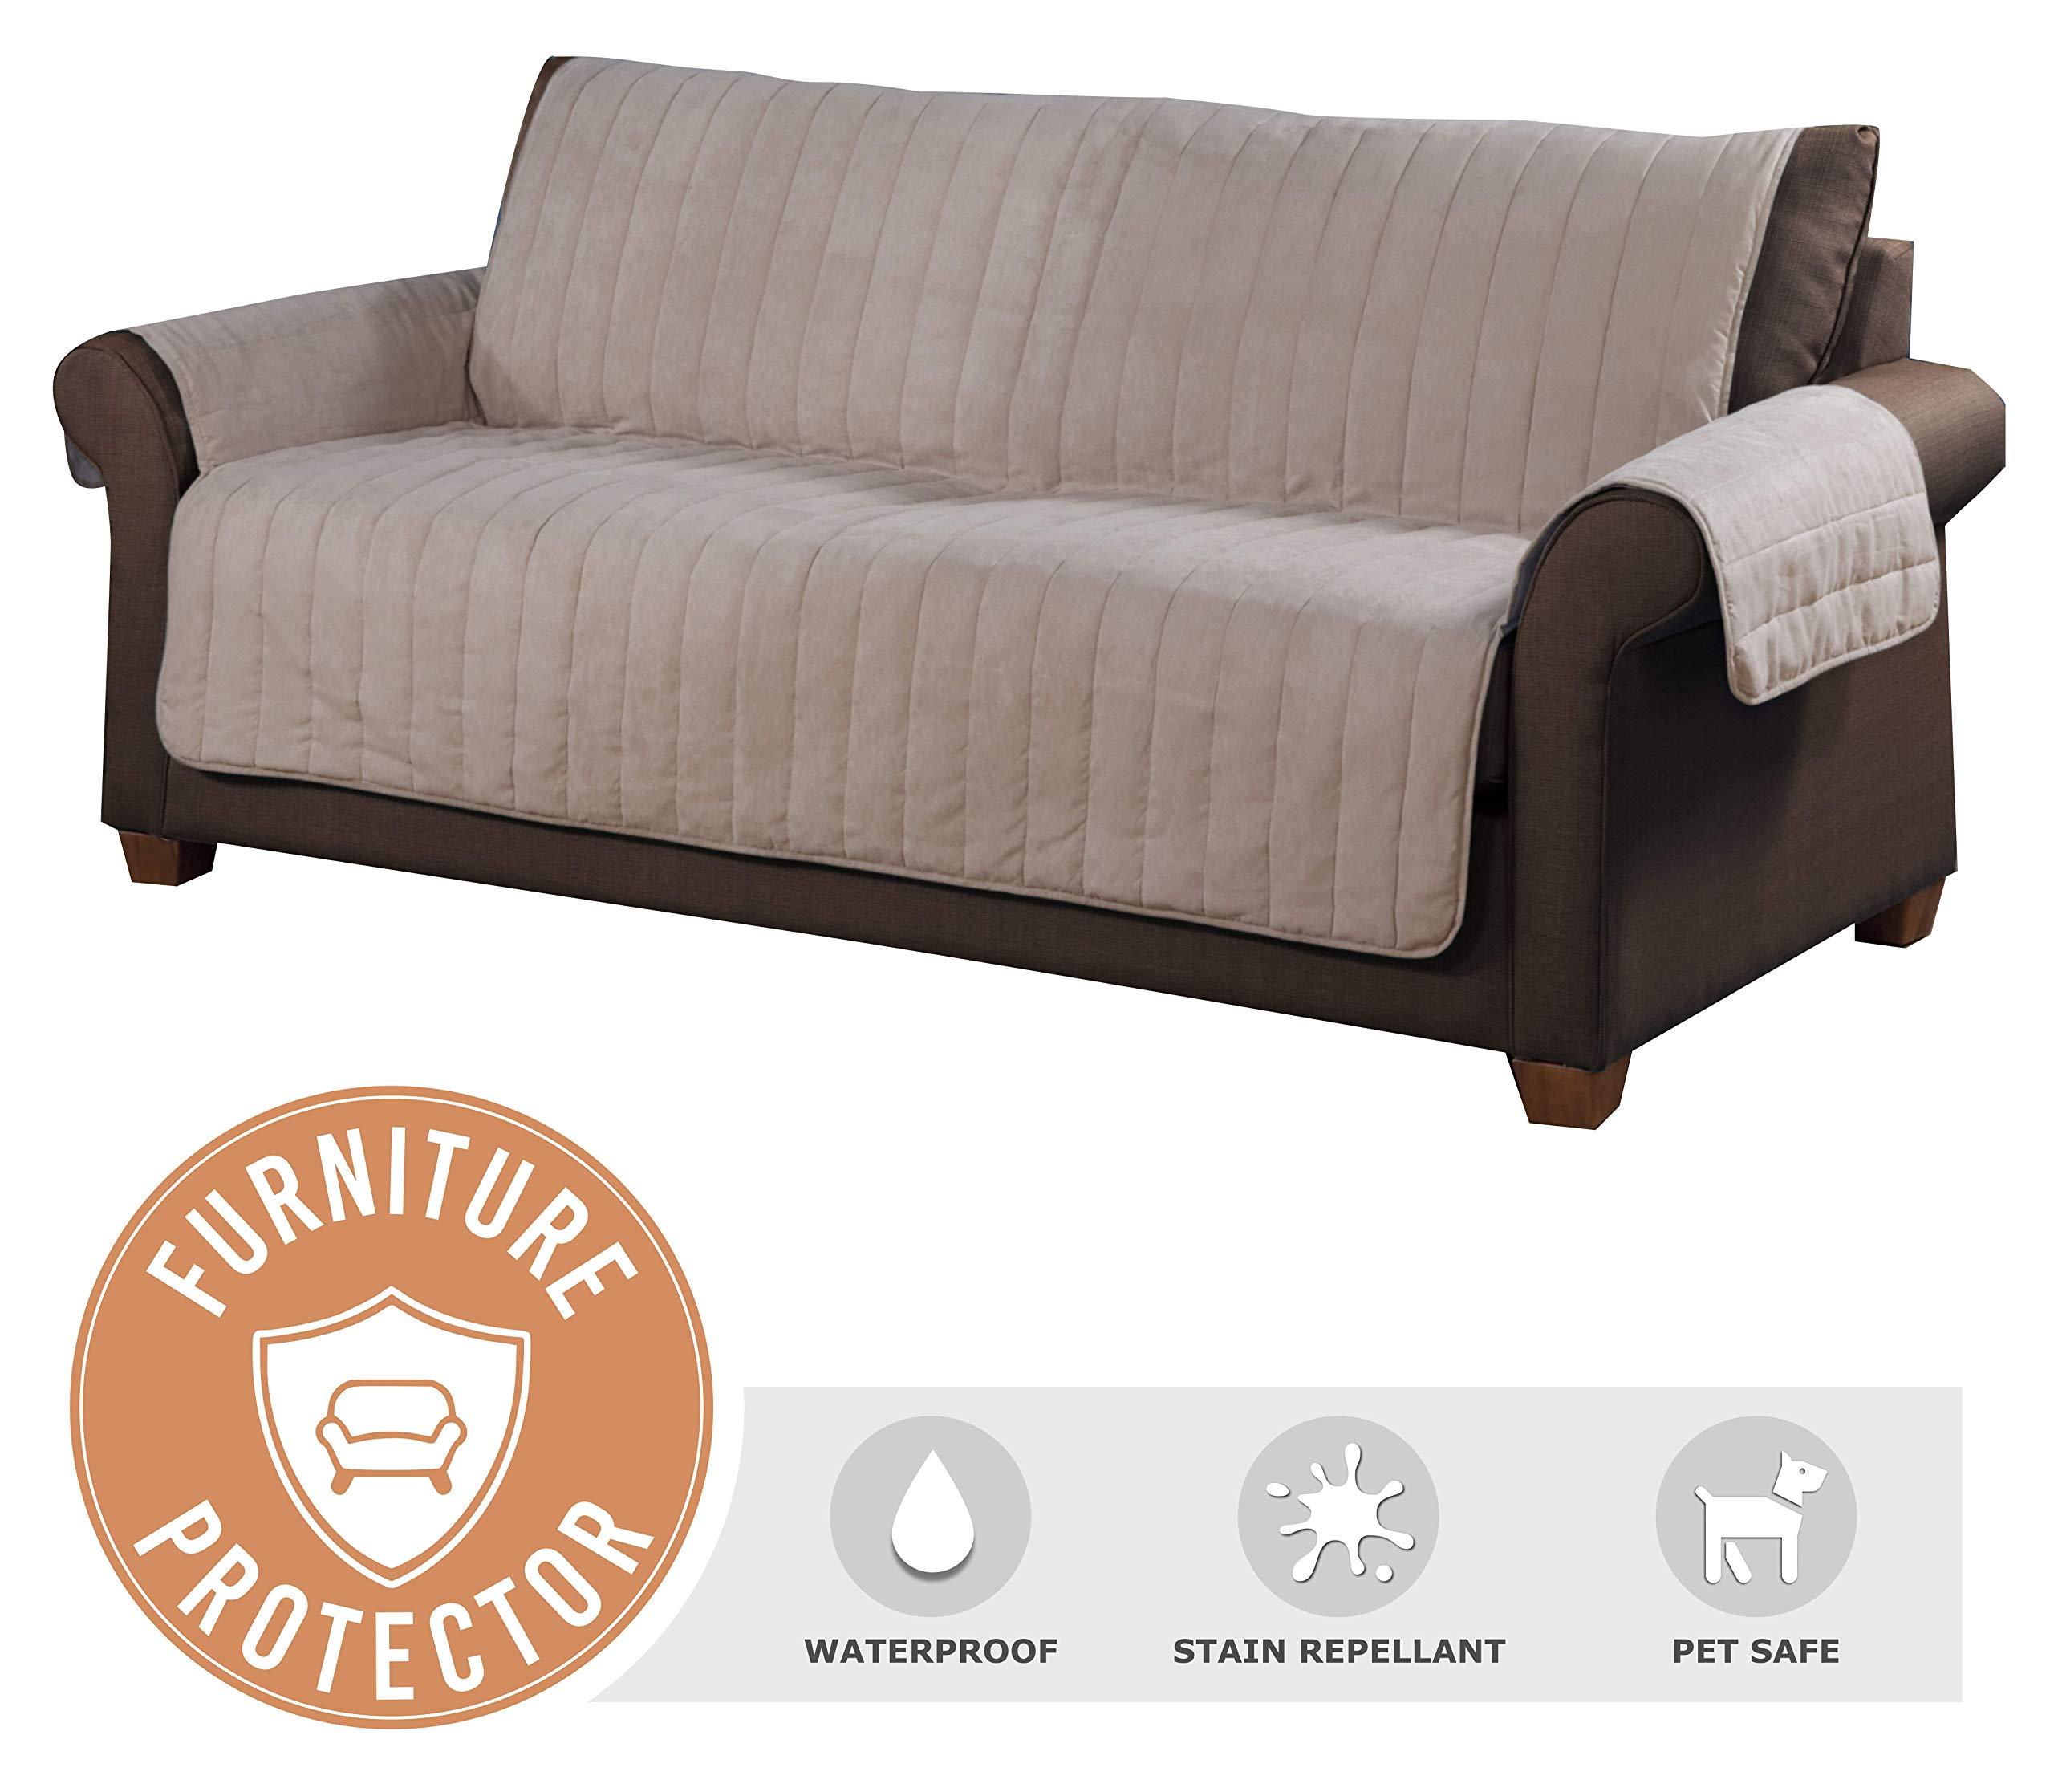 Tailor Fit Microsuede Loveseat Furniture Protector, Pet Safe, Stain Repellant & Waterproof (Tan)